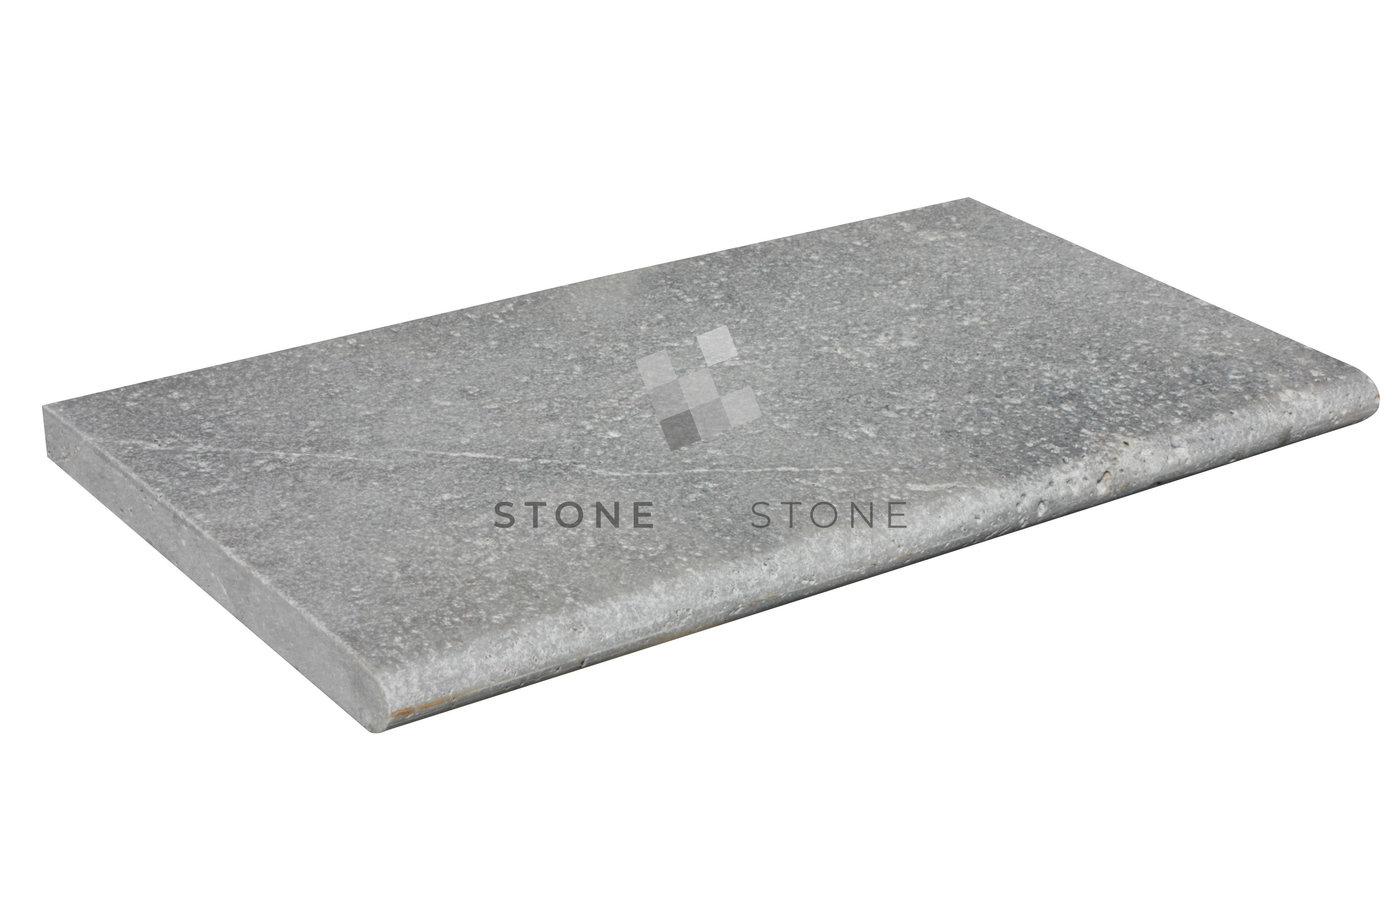 33x61/3cm Bord droit - Travertin Antik - Vieilli 1er Choix - Silver